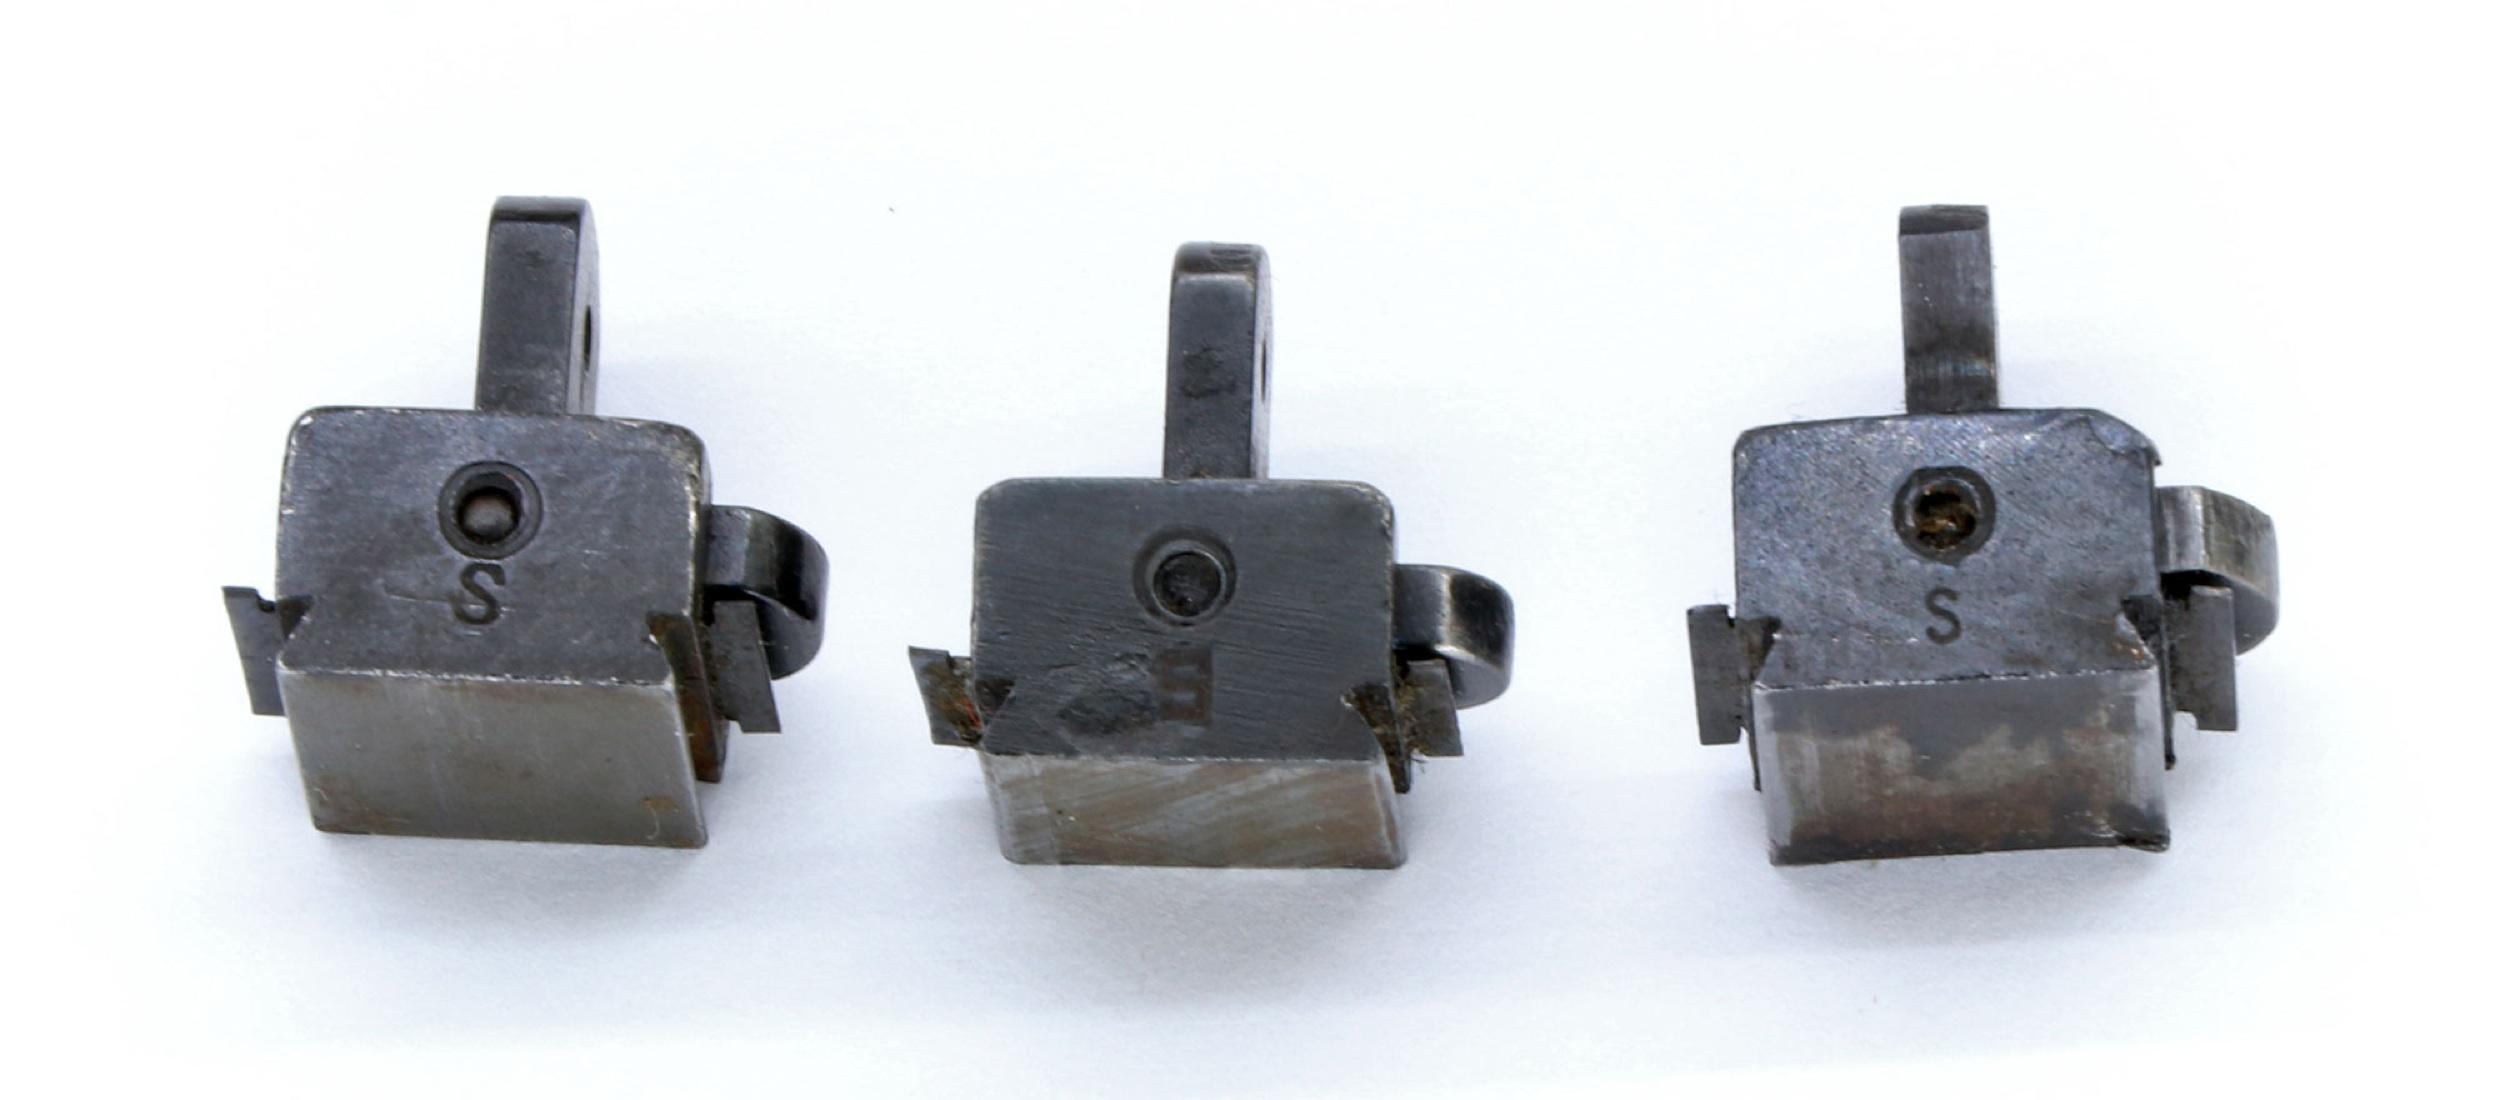 M1 Carbine Flip Rear Sights